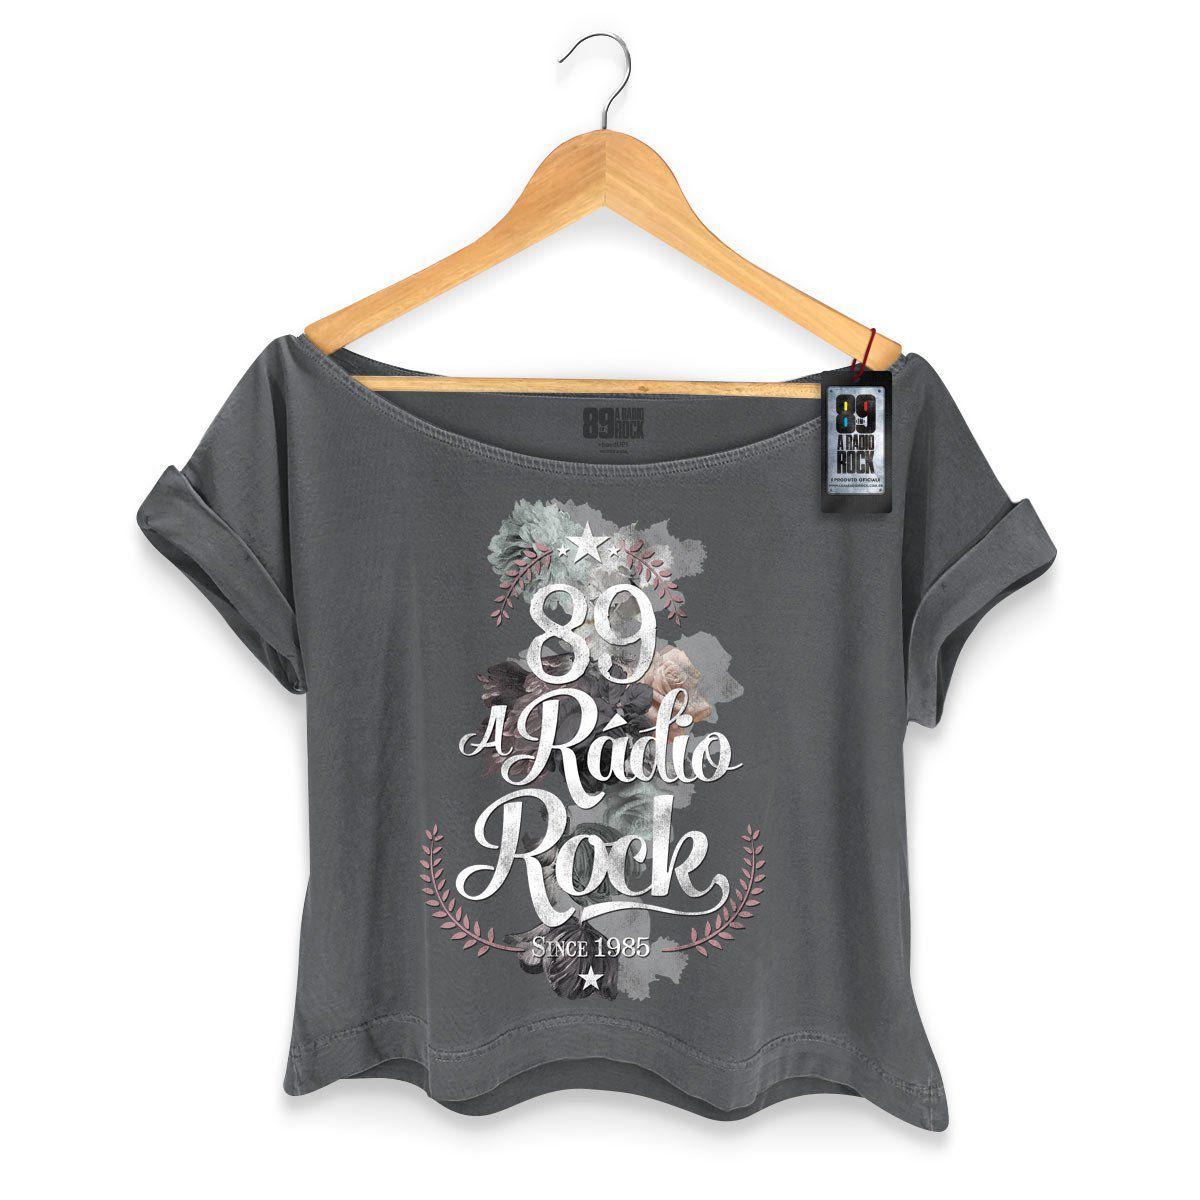 T-shirt Premium Feminina 89FM Since 1985  - bandUP Store Marketplace